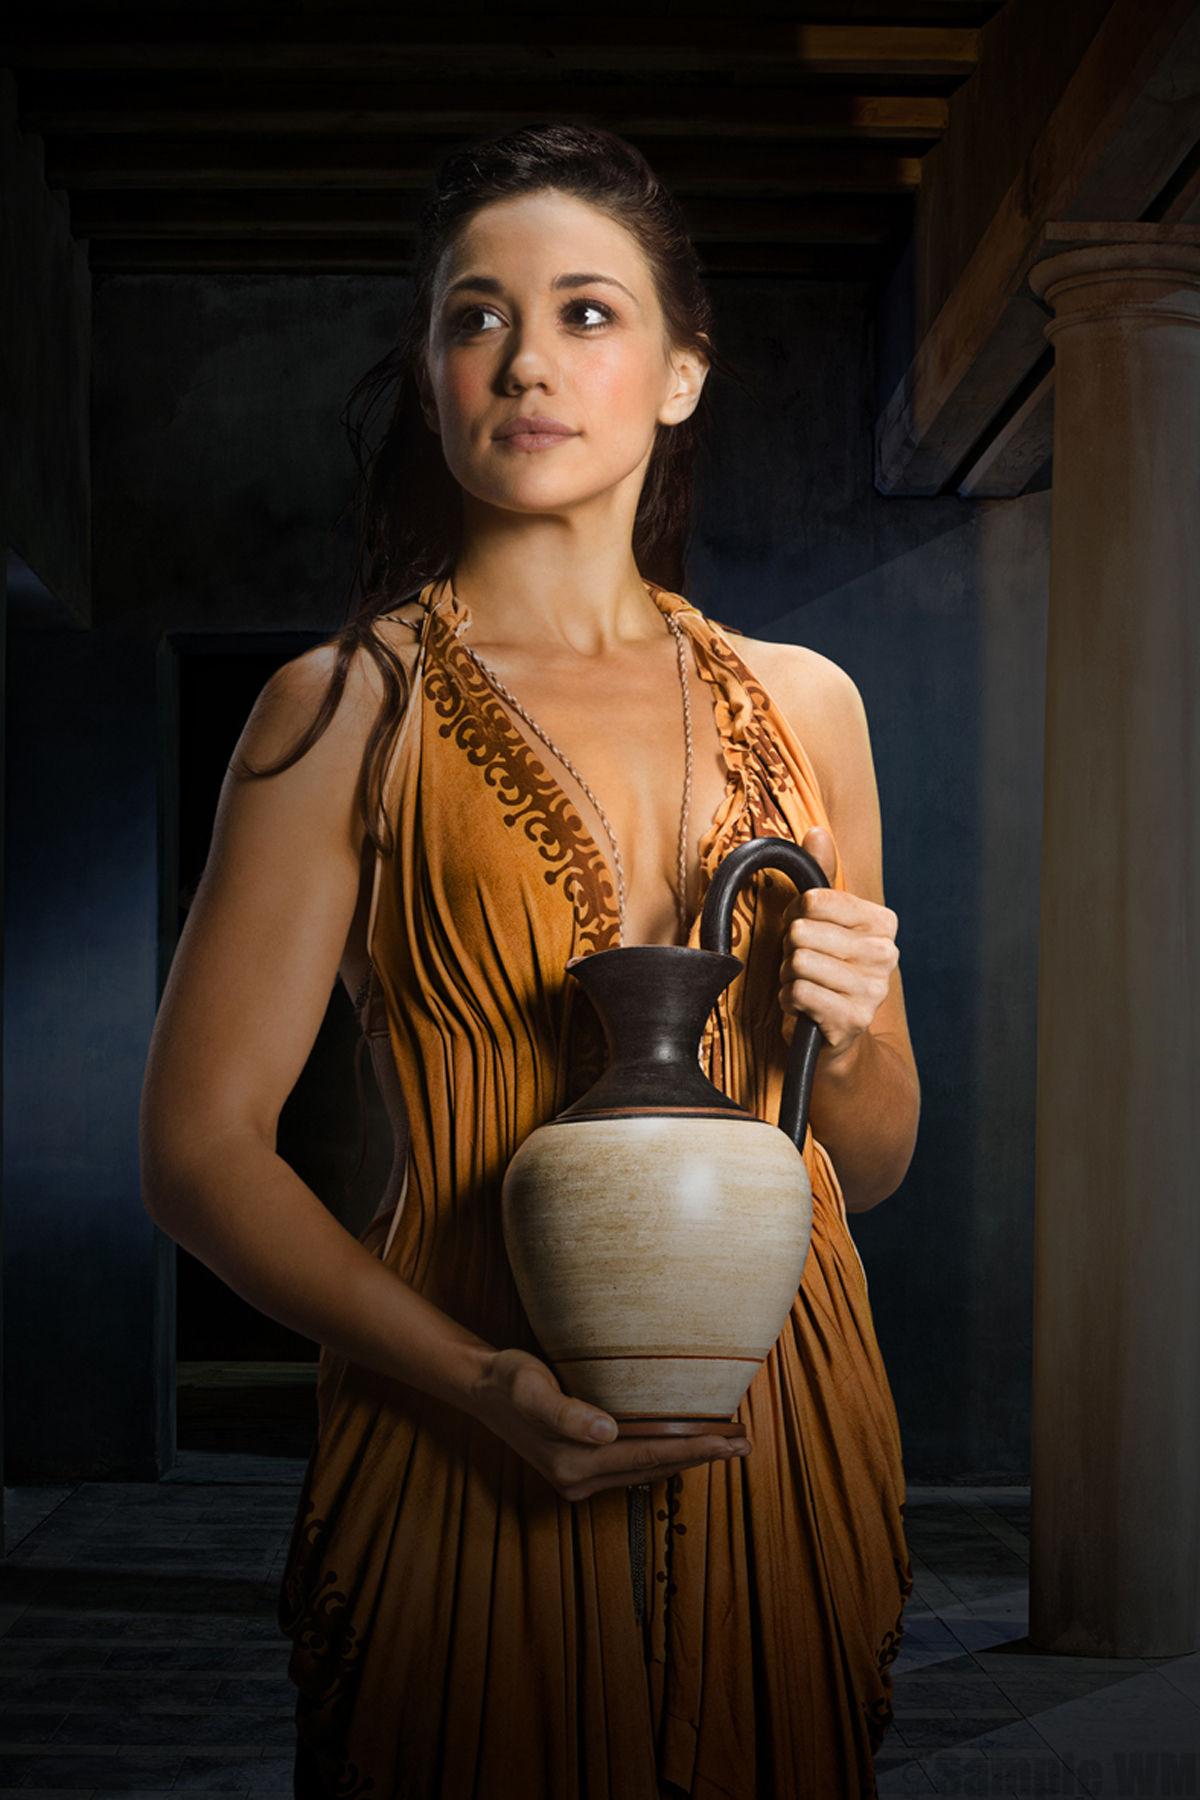 spartacus season 3 episode 1 full episode in english